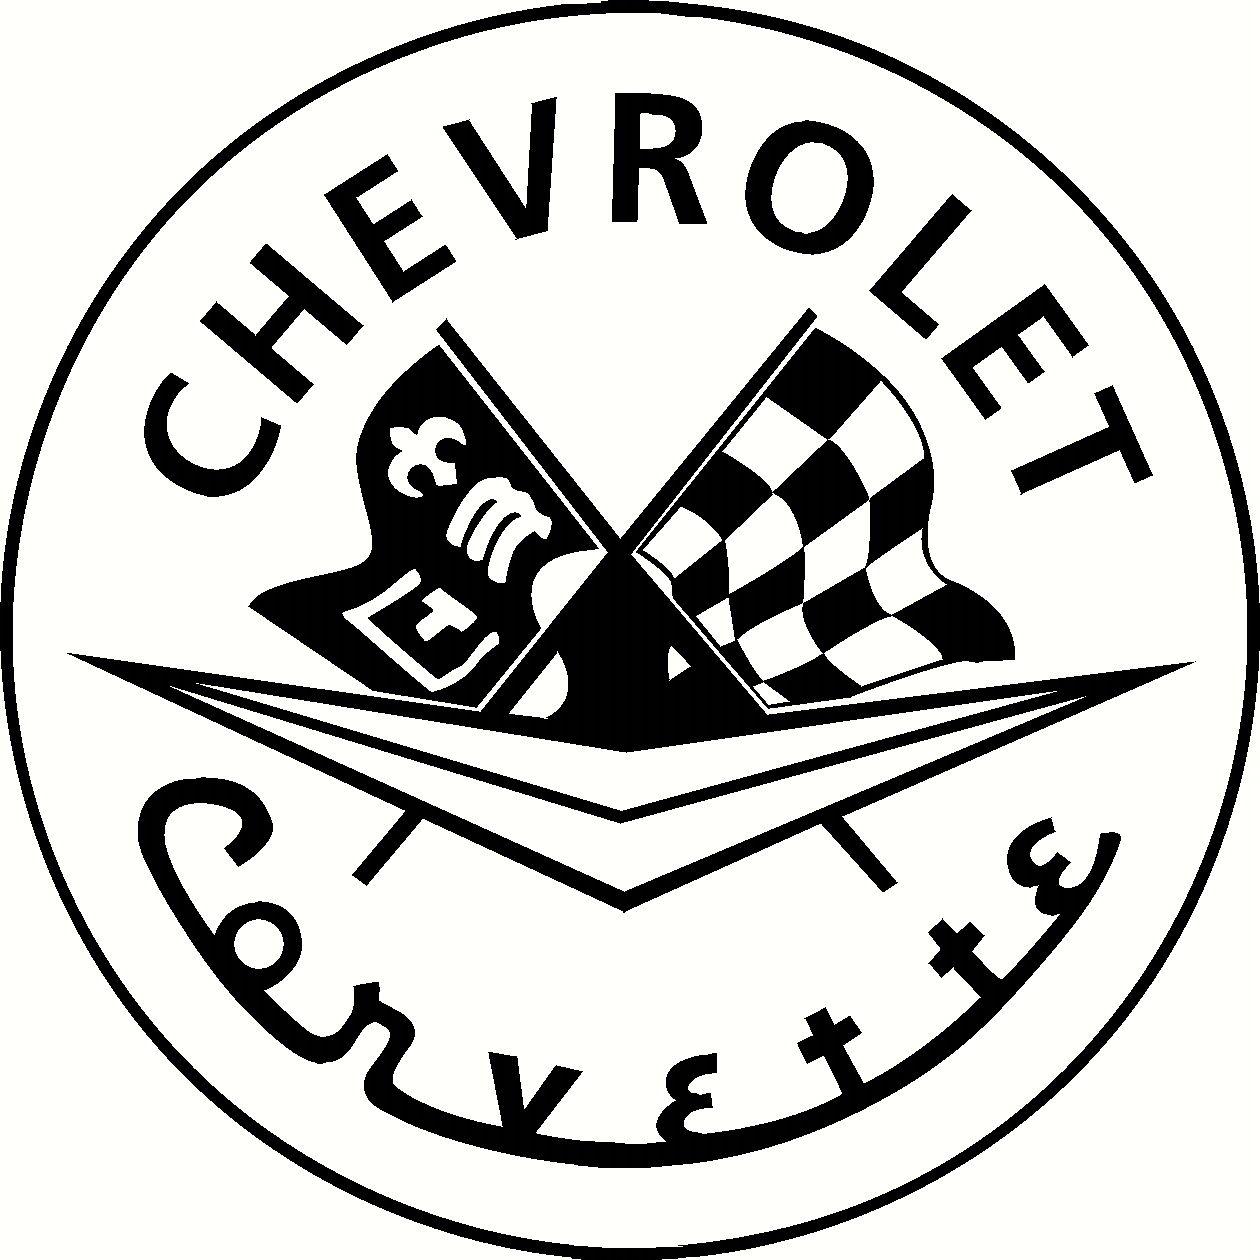 Chevy Emblem Drawing At Getdrawings